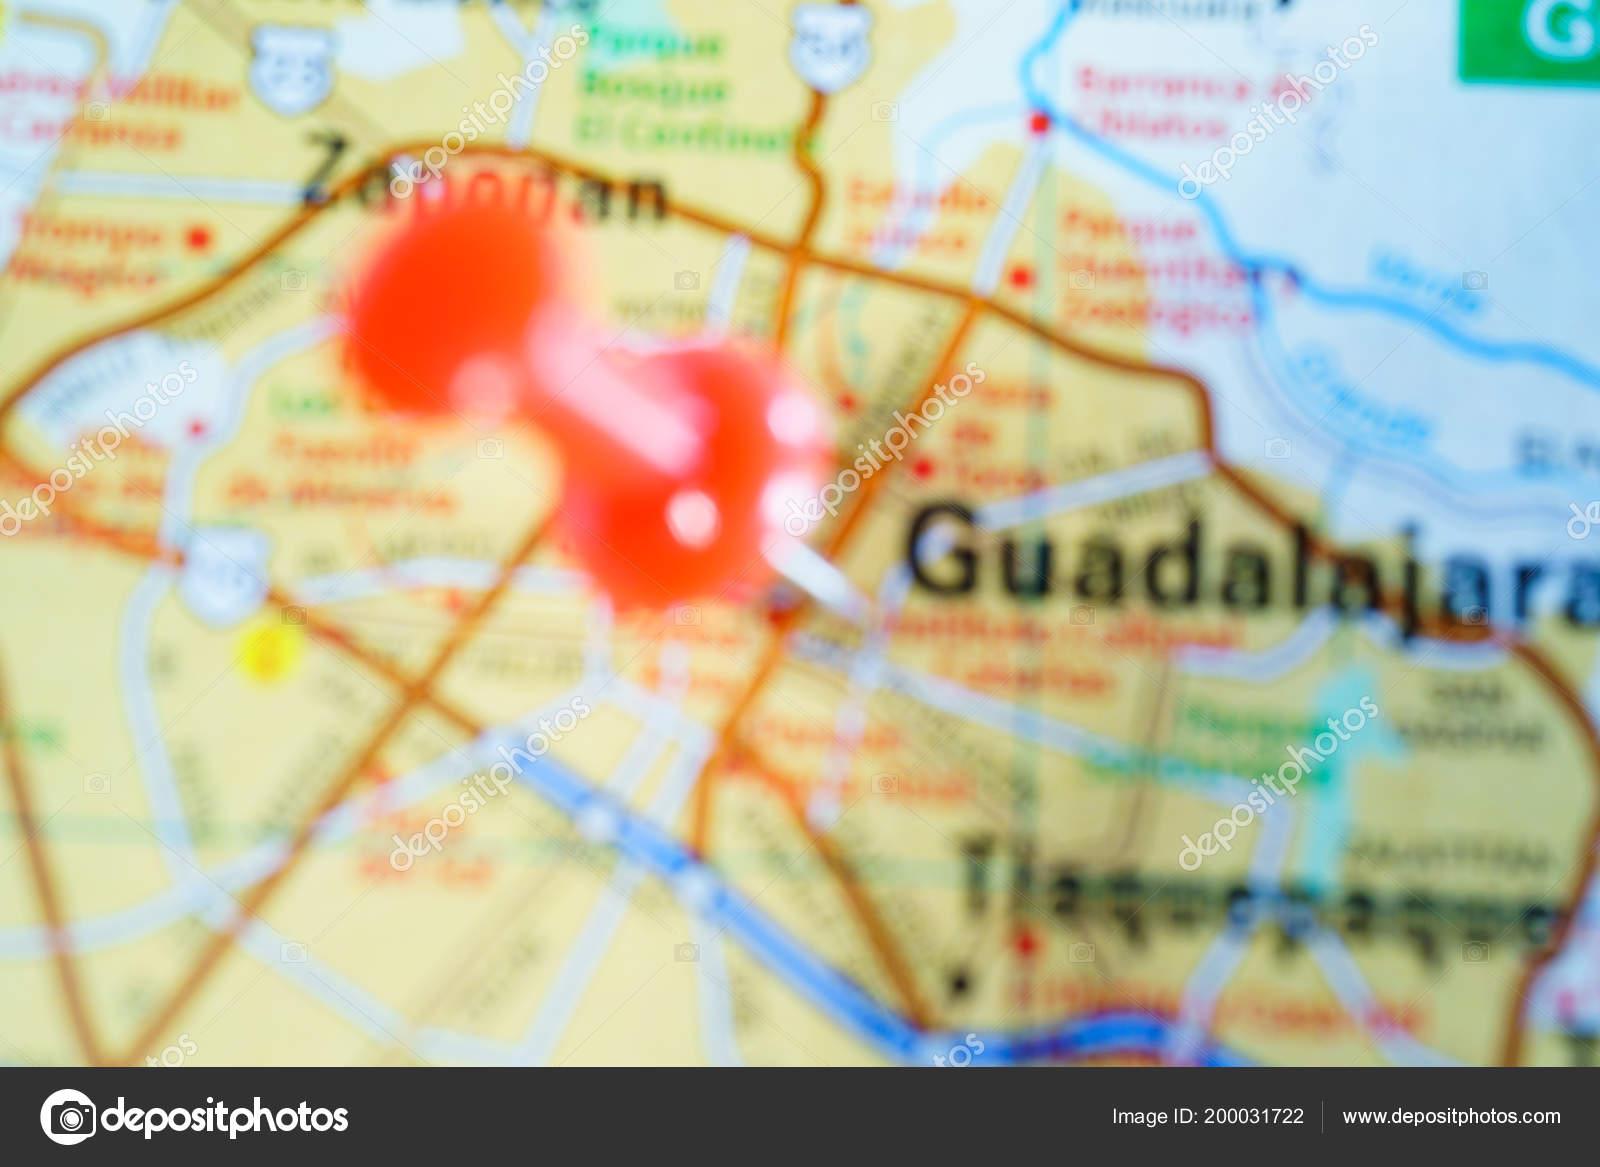 Guadalajara Mexico Mapa Fotos De Stock C Aallm 200031722